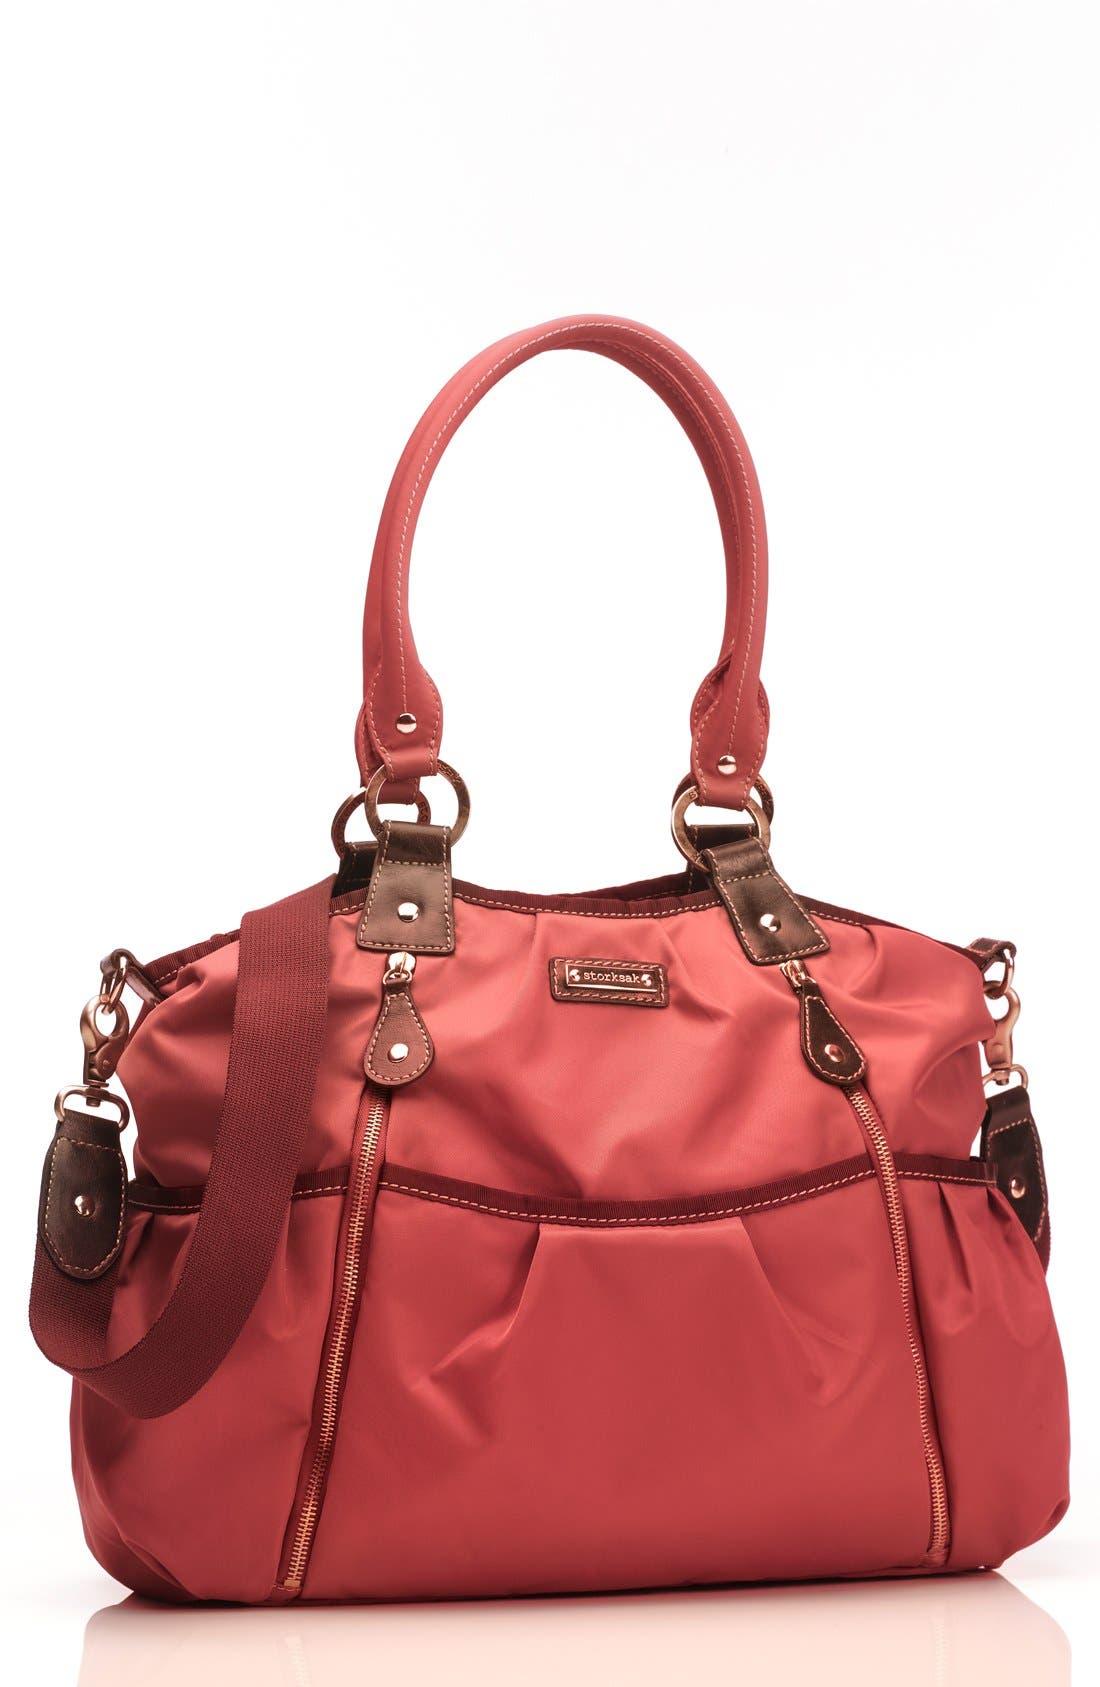 Storksak 'Olivia' Nylon Diaper Bag